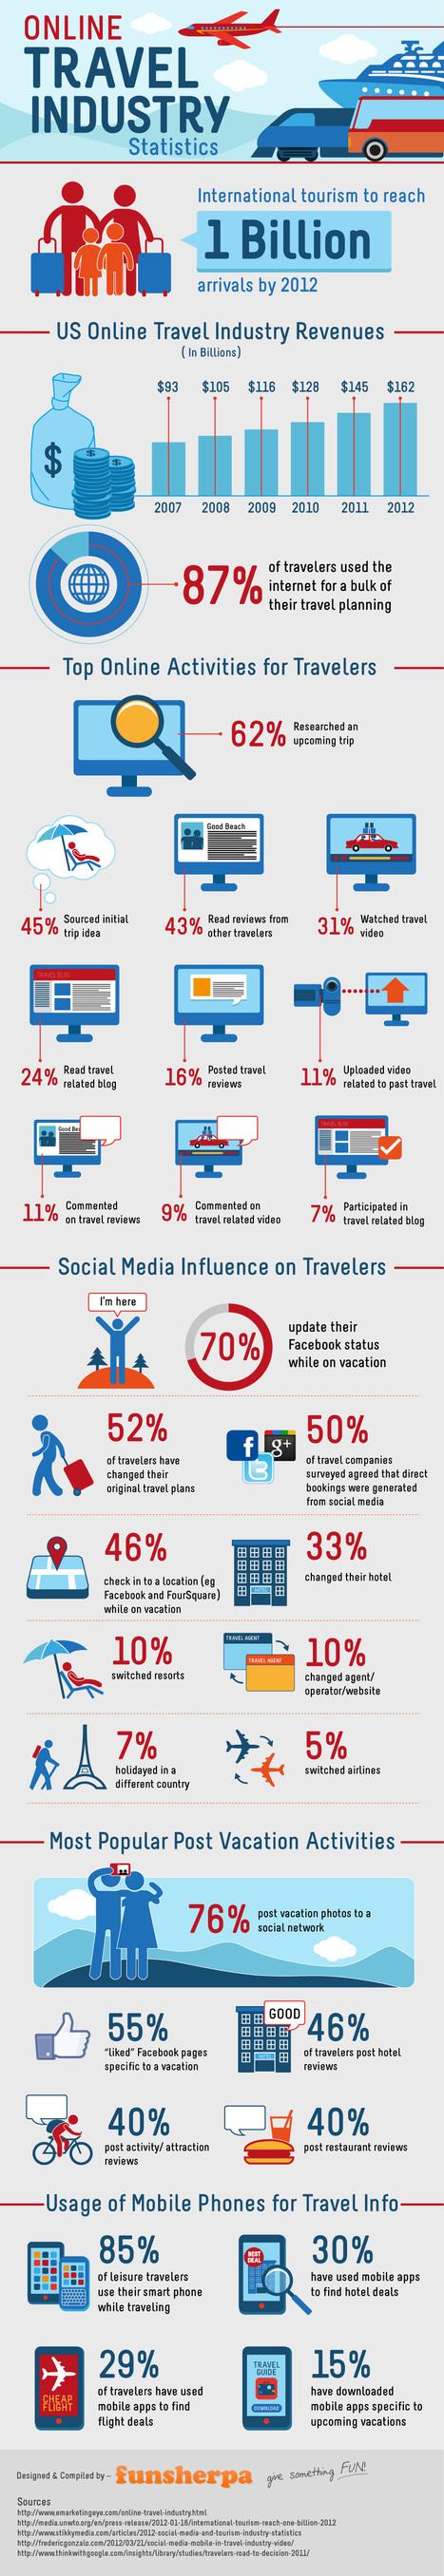 The Impact of Social Media on Travel (Infographic)   Business 2 Community   Tecnologie: Soluzioni ICT per il Turismo   Scoop.it